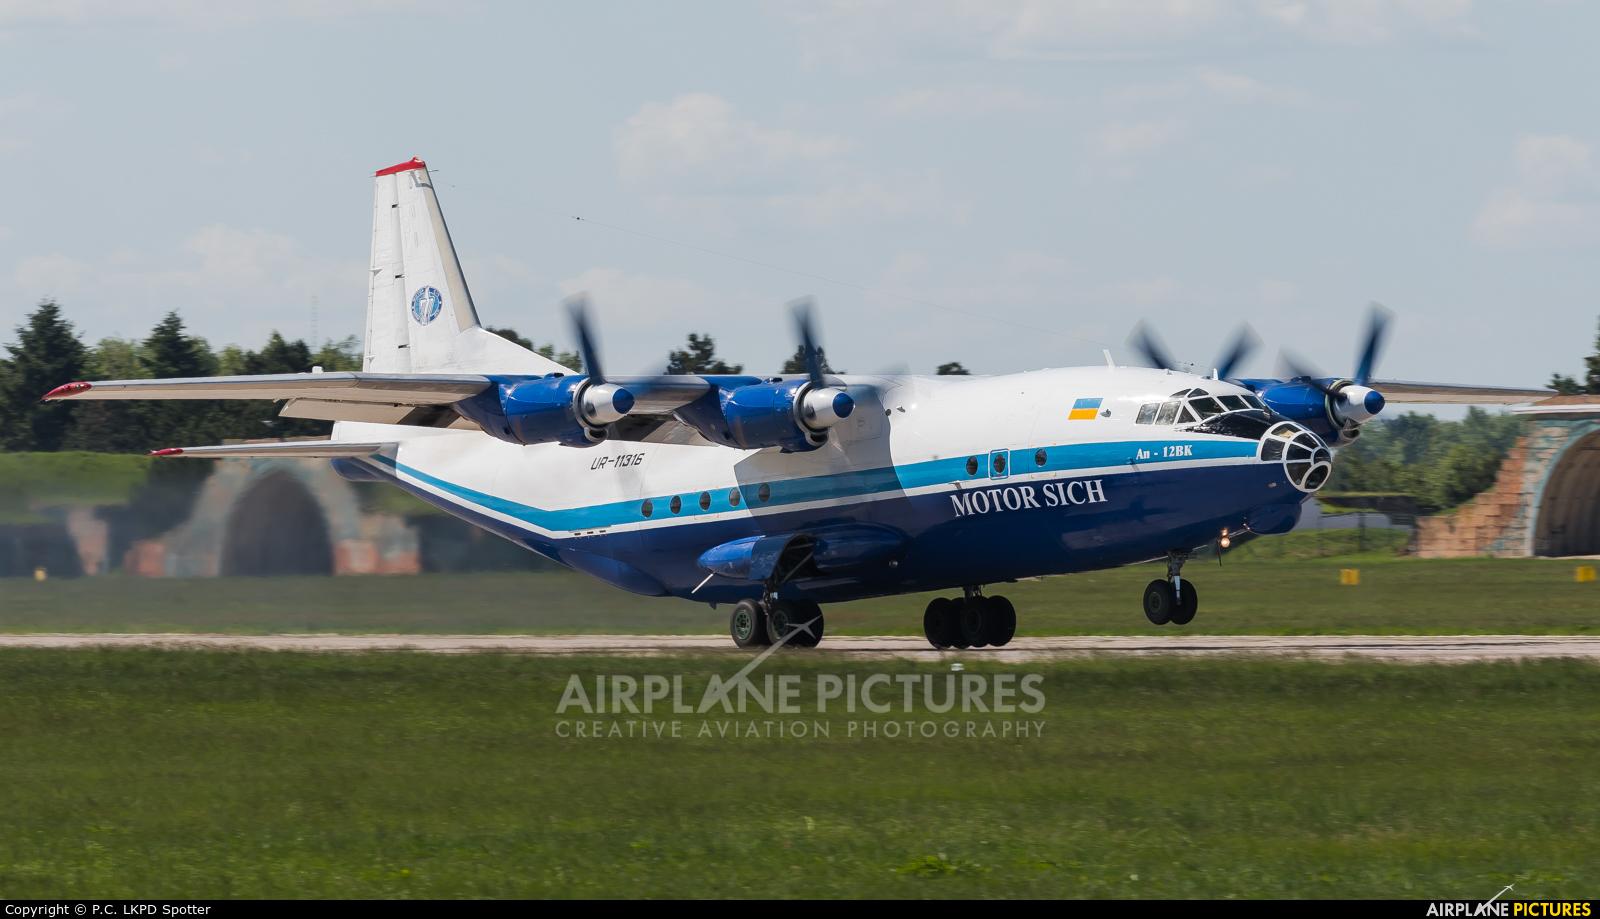 Motor Sich UR-11316 aircraft at Pardubice